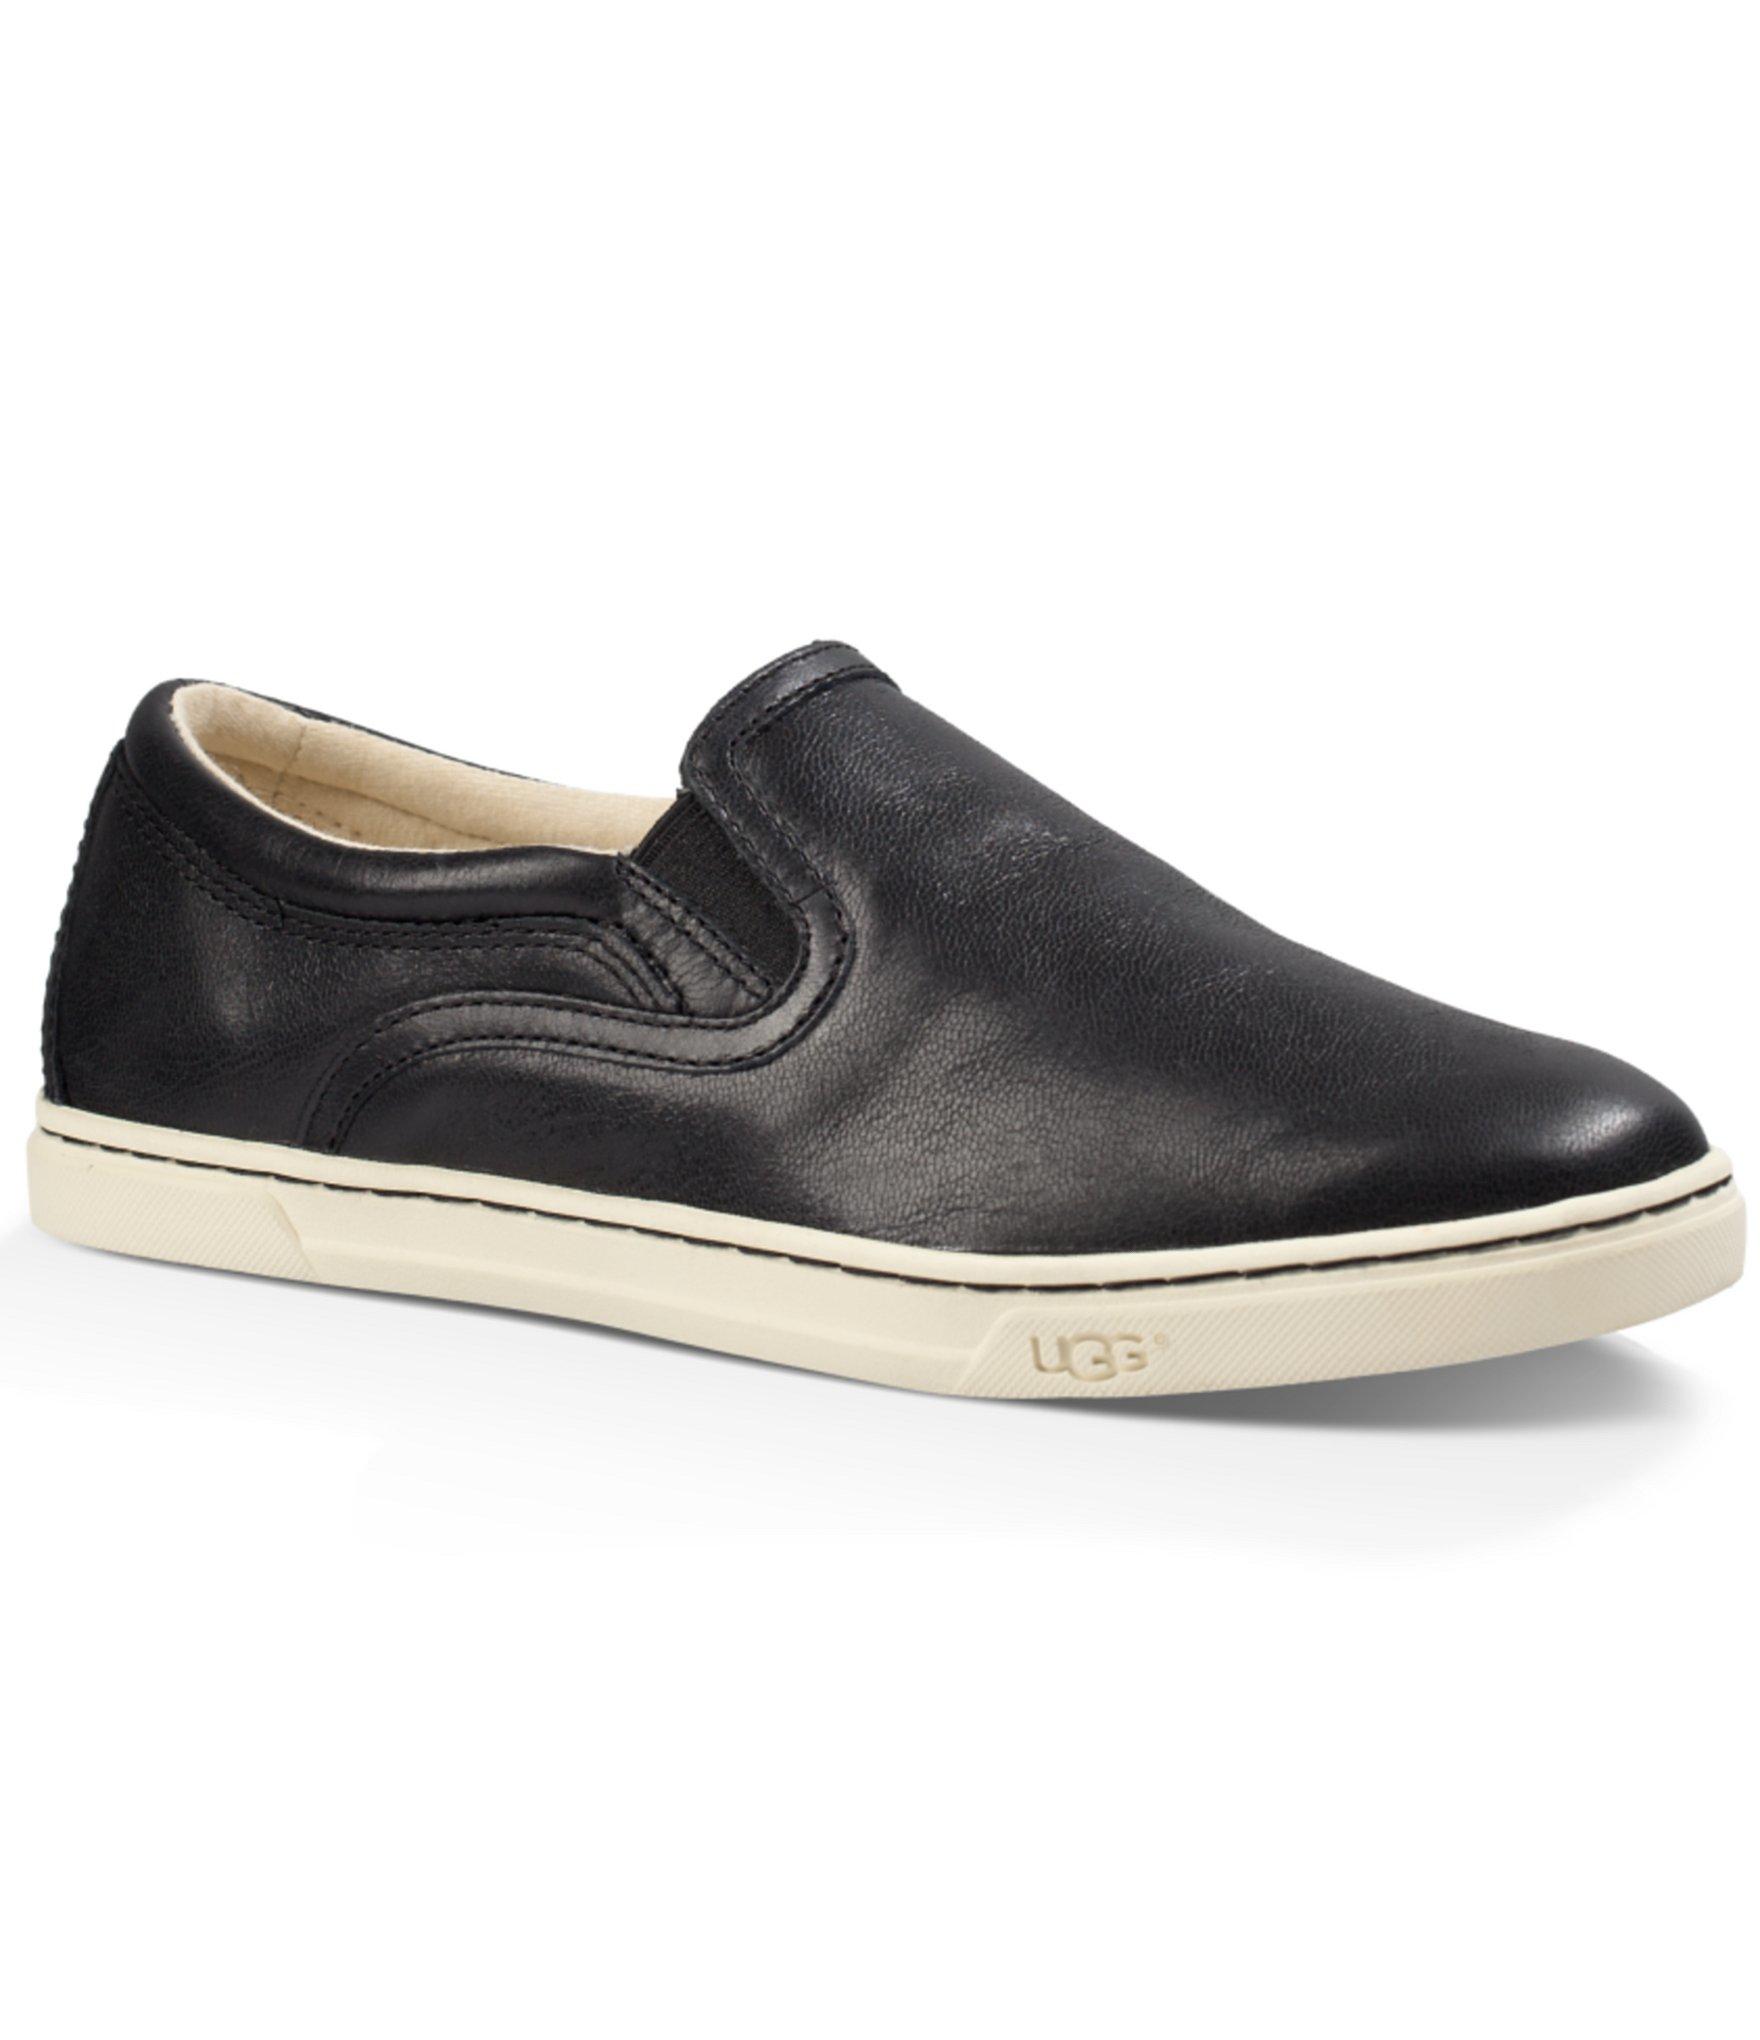 5101a164bb5 UGG Black ® Fierce Leather Sneakers